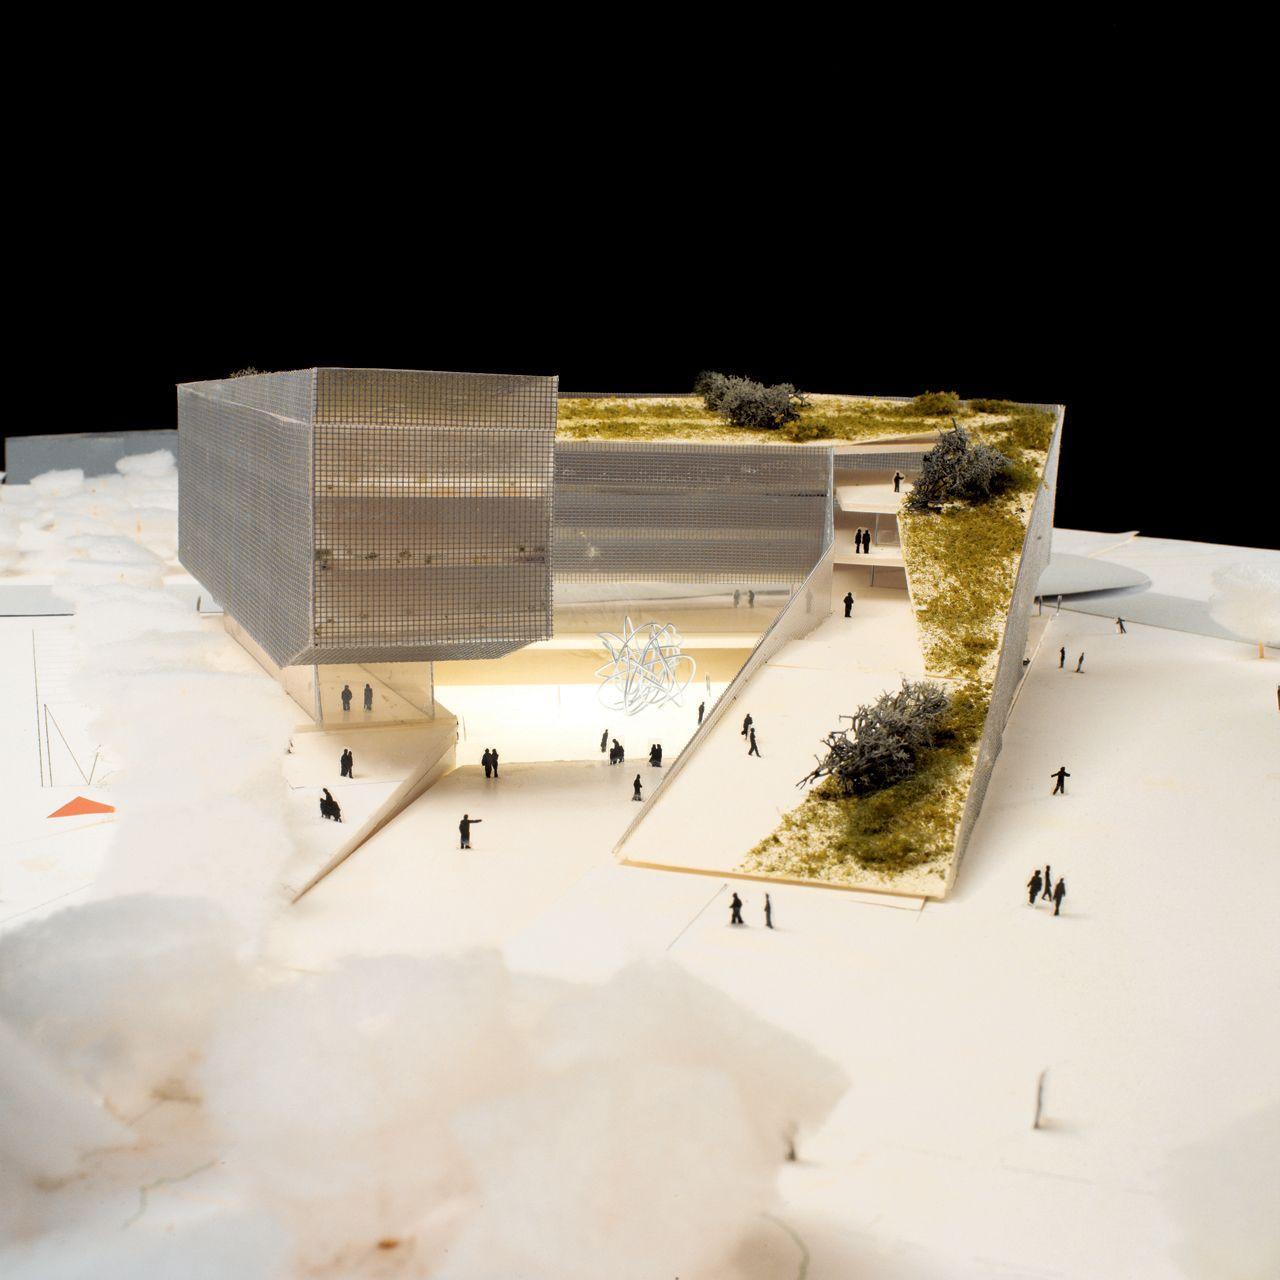 Mario cucinella architects slope archi pinterest for Cucinella architects